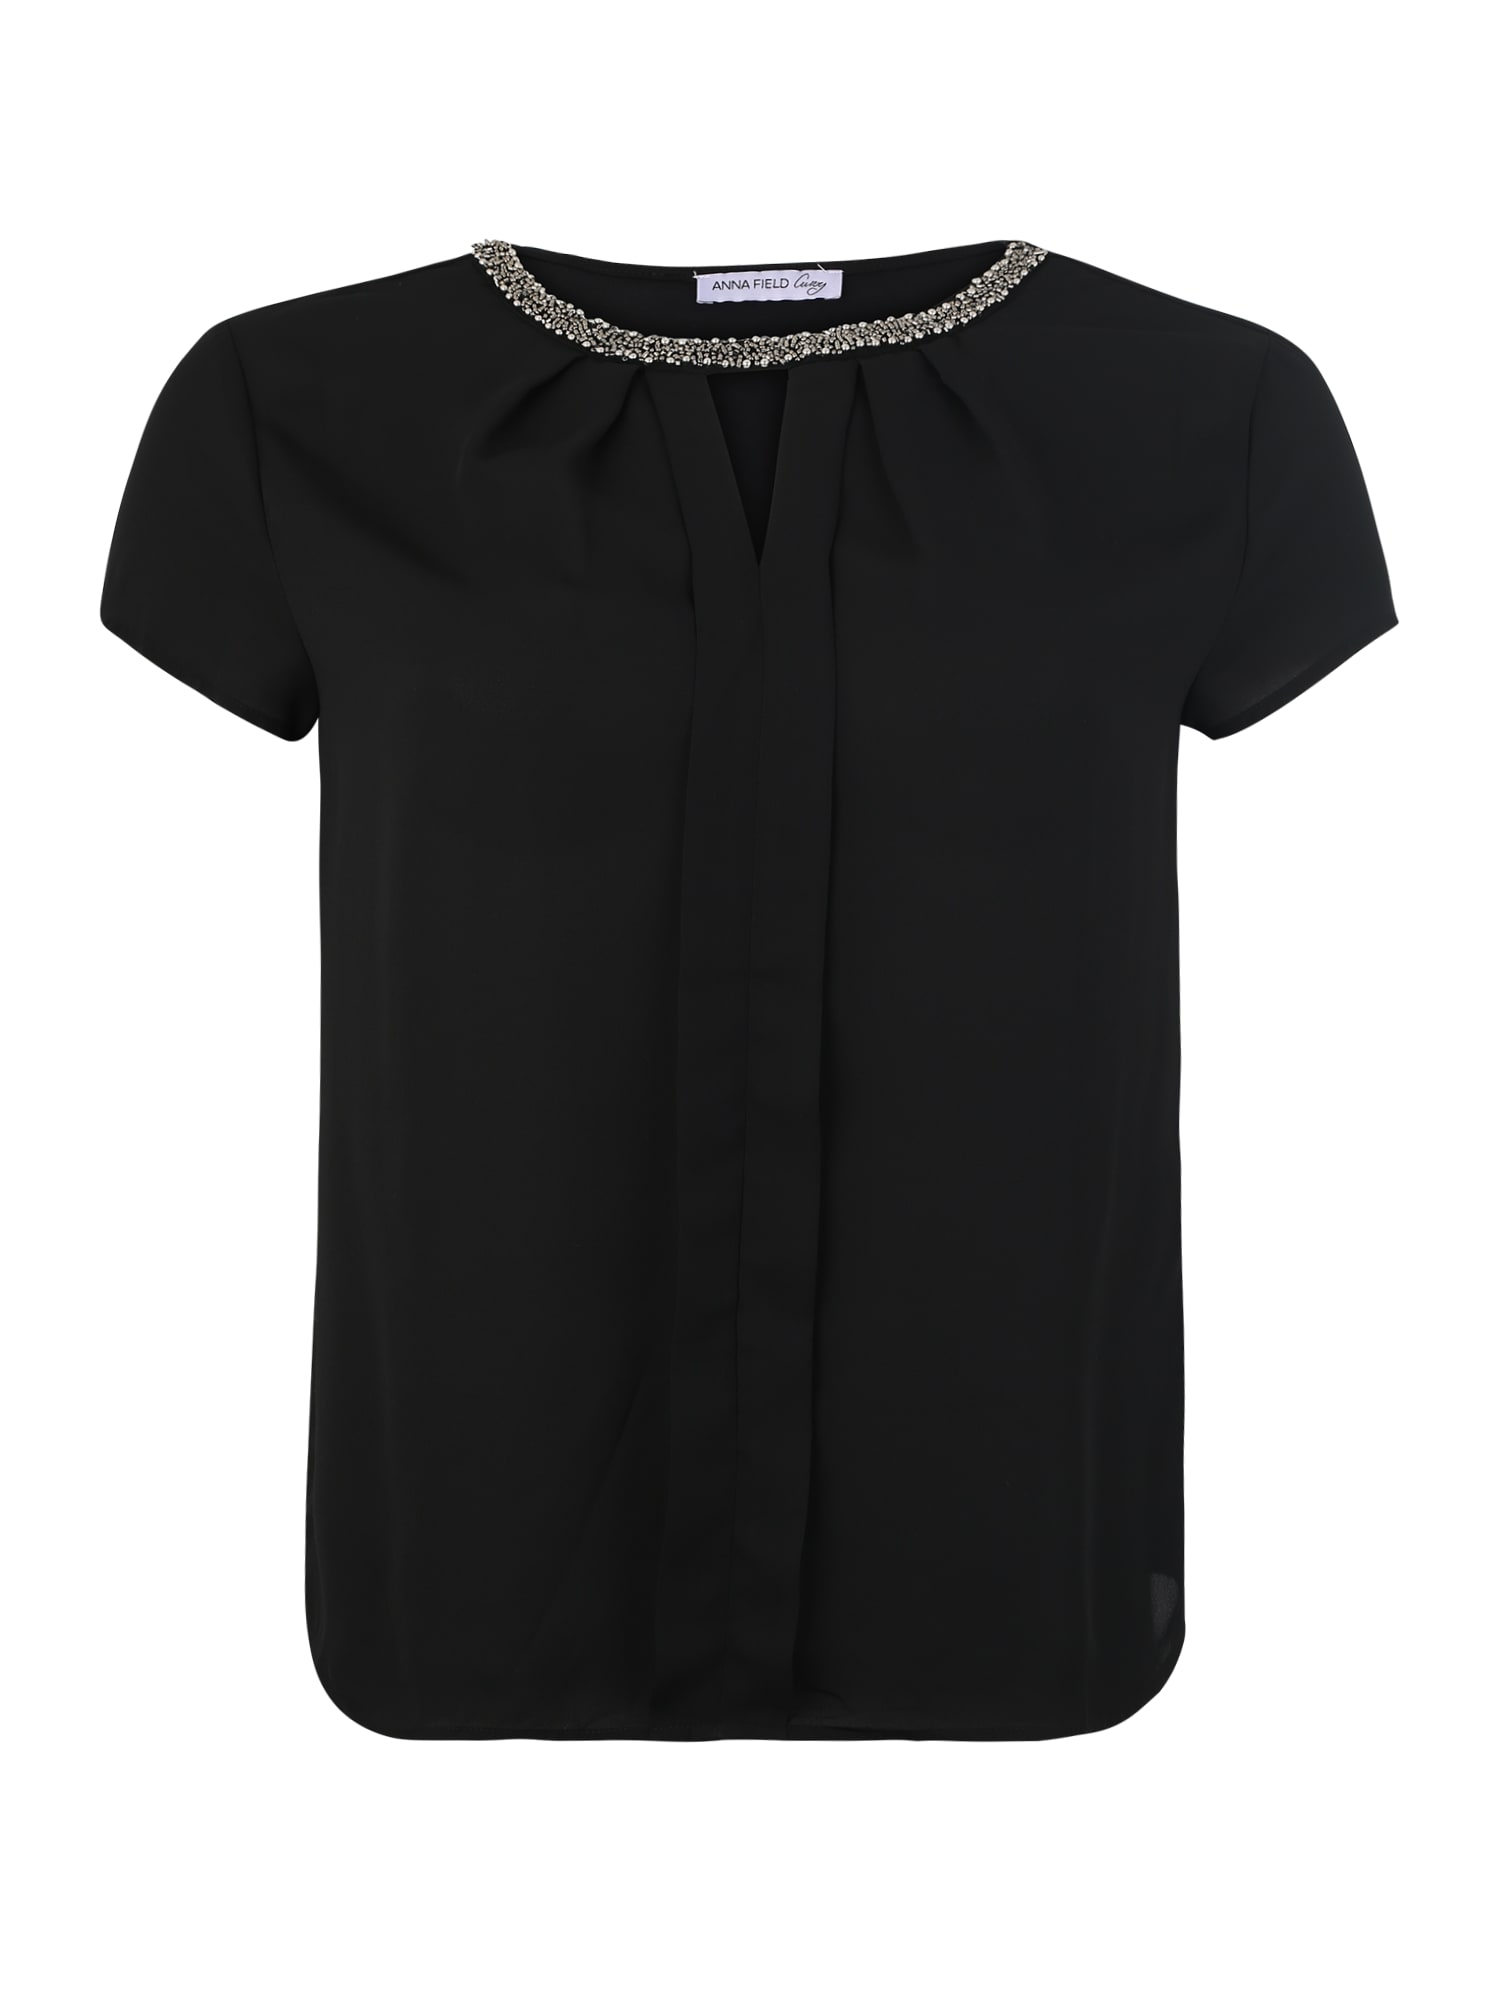 Tričko Pleated woven front t-shirt černá Anna Field Curvy